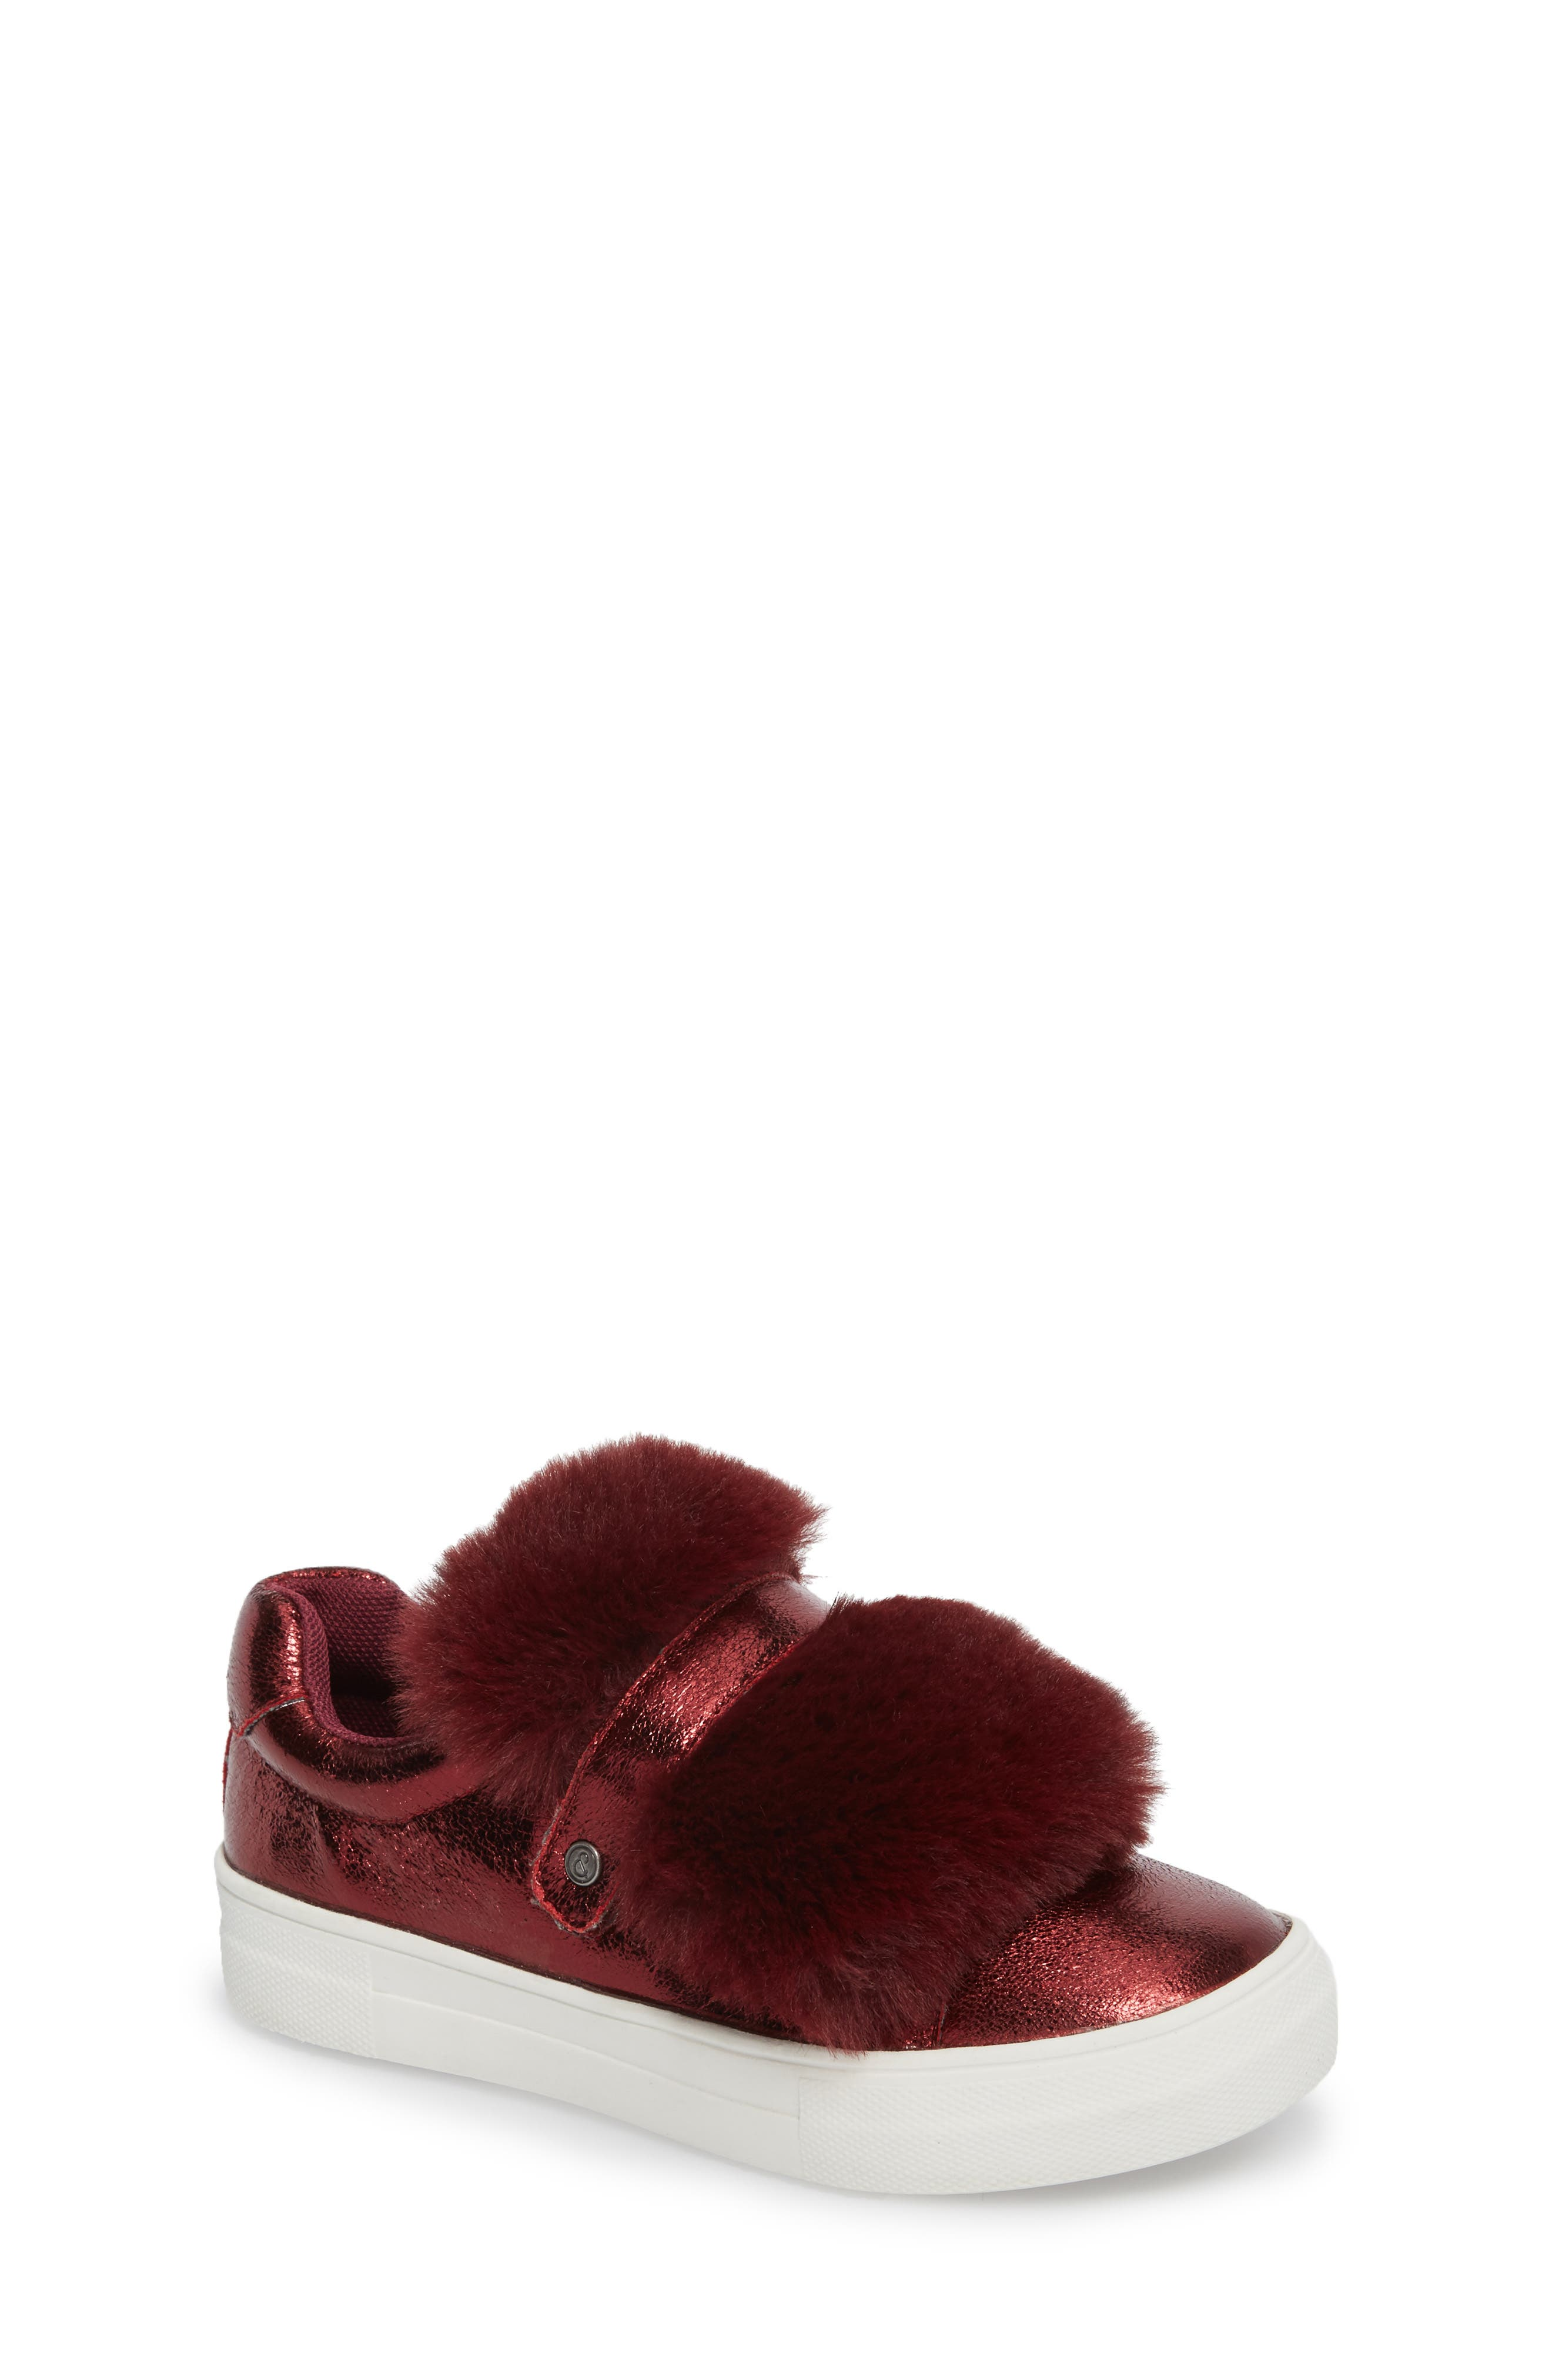 Treasure & Bond Zandra Faux Fur Metallic Sneaker (Toddler, Little Kid & Big Kid)